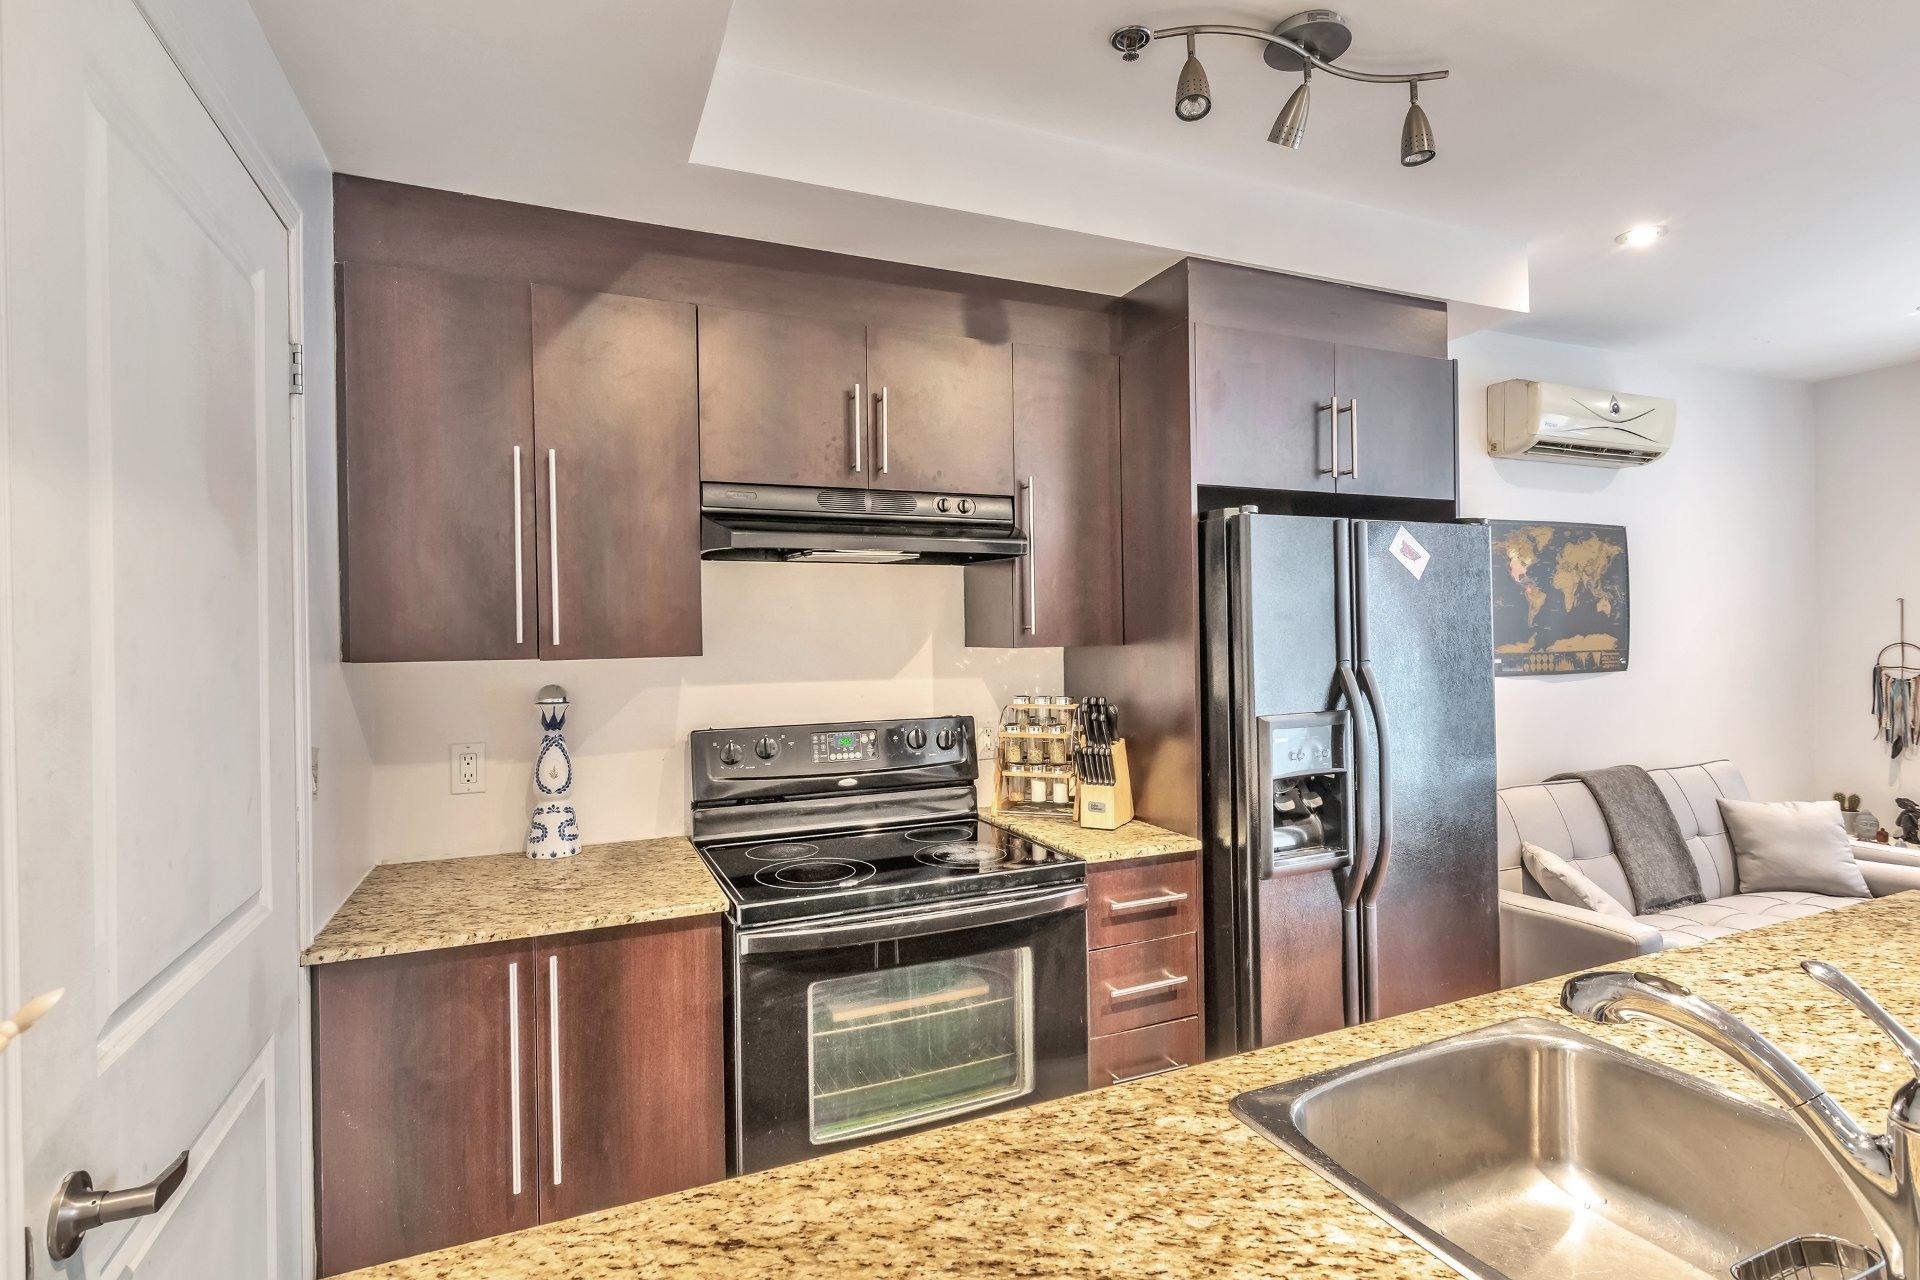 image 9 - Departamento En venta Le Plateau-Mont-Royal Montréal  - 3 habitaciones